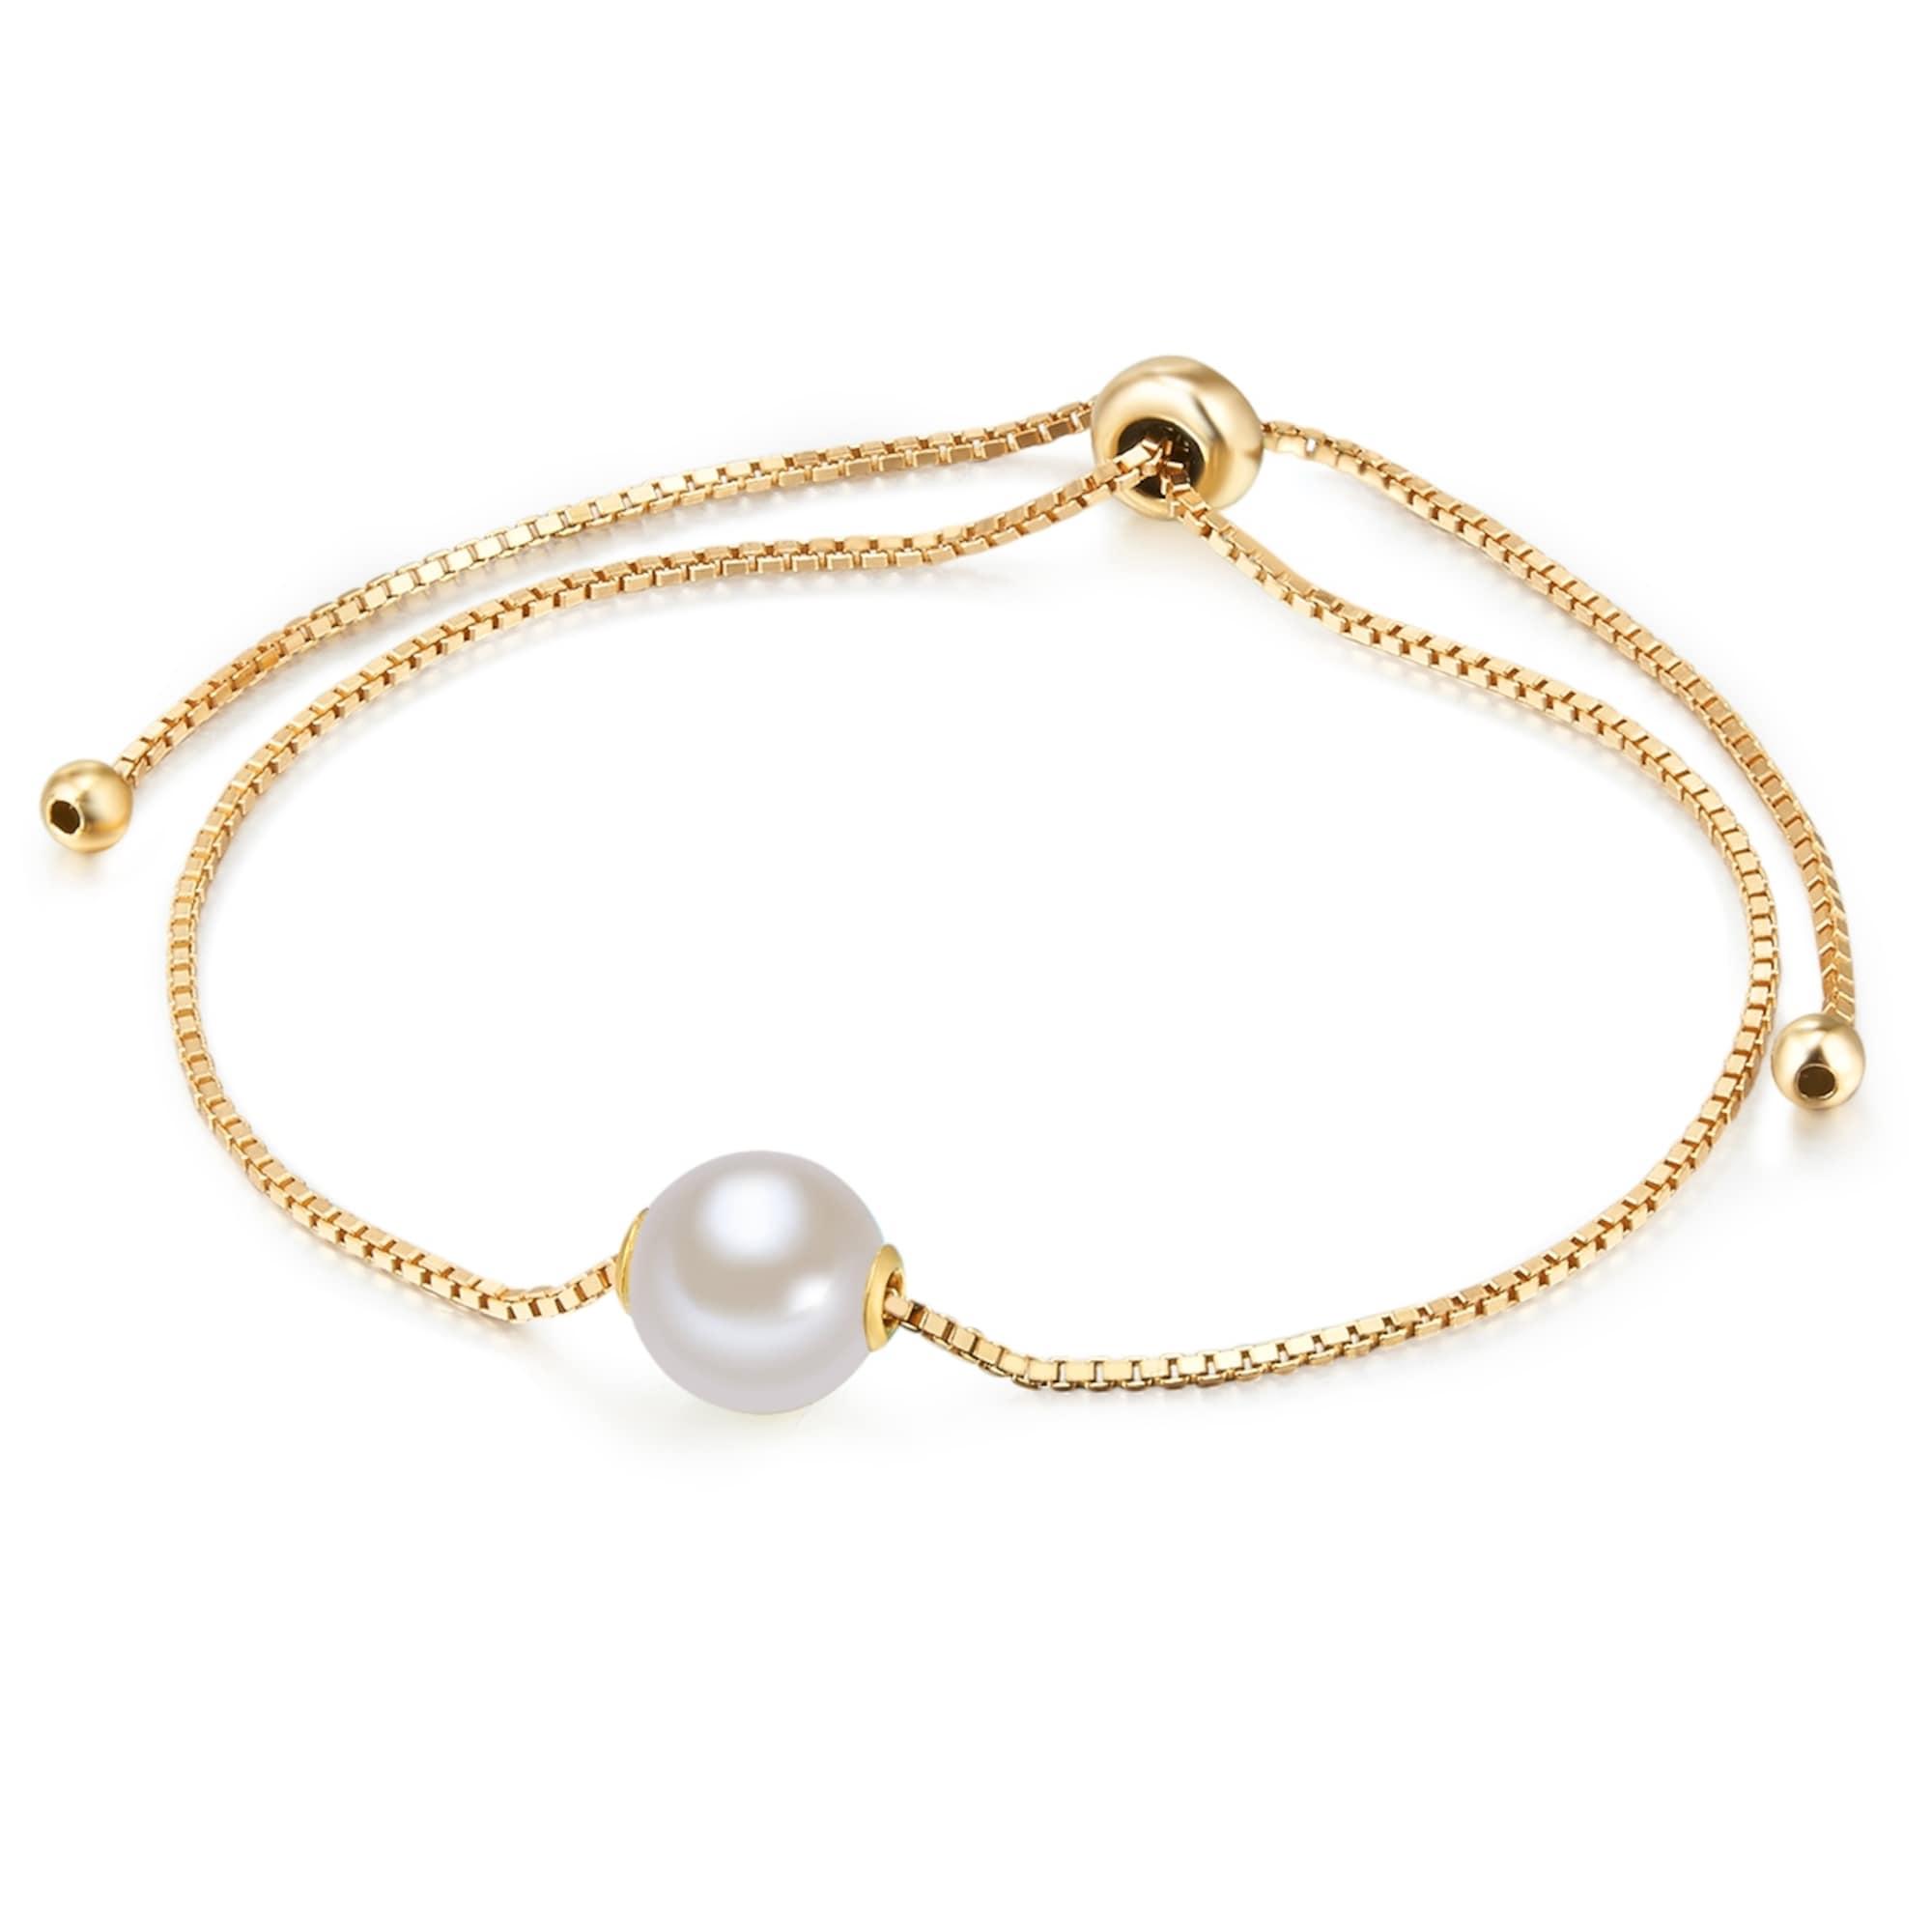 Armkette | Schmuck > Armbänder > Armketten | Valero Pearls